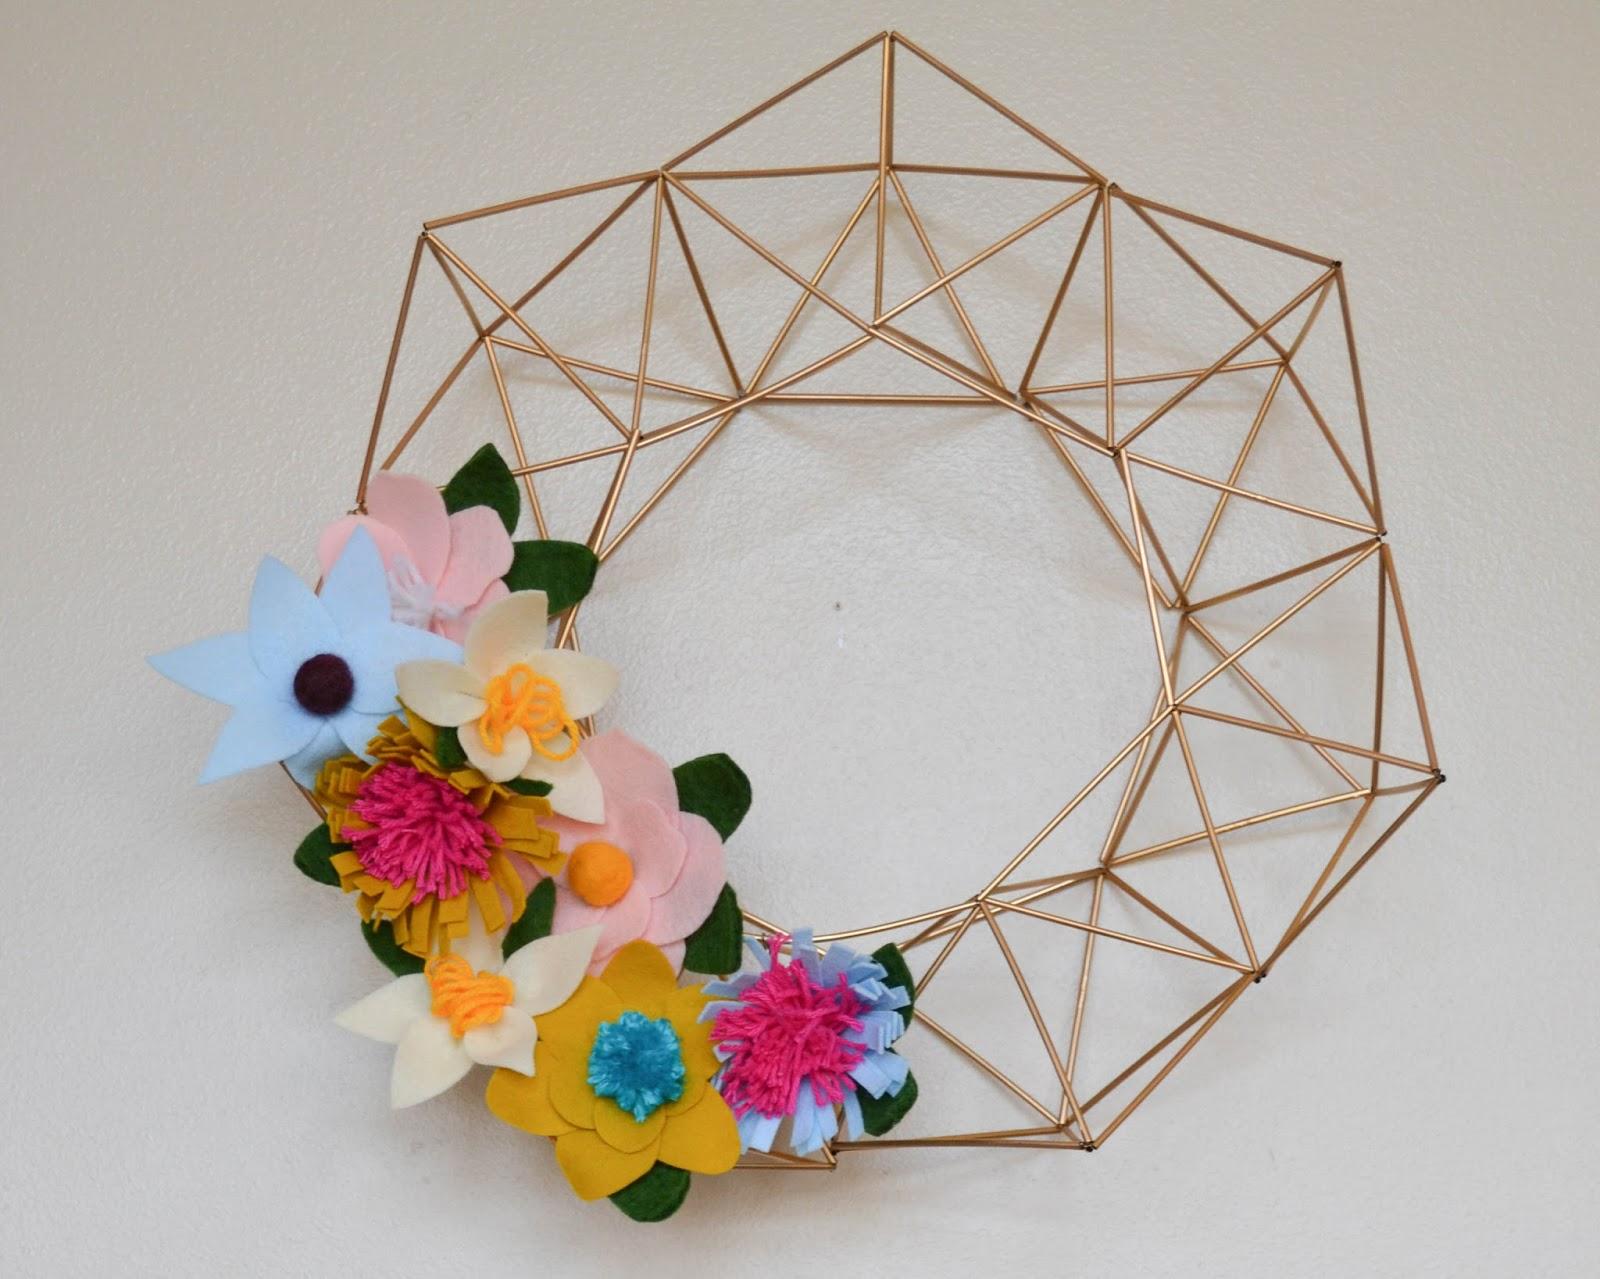 Wreath Decor Doorway Laurel Garland Geometric Gold Felt Paper Flowers  Floral Modern Wreaths